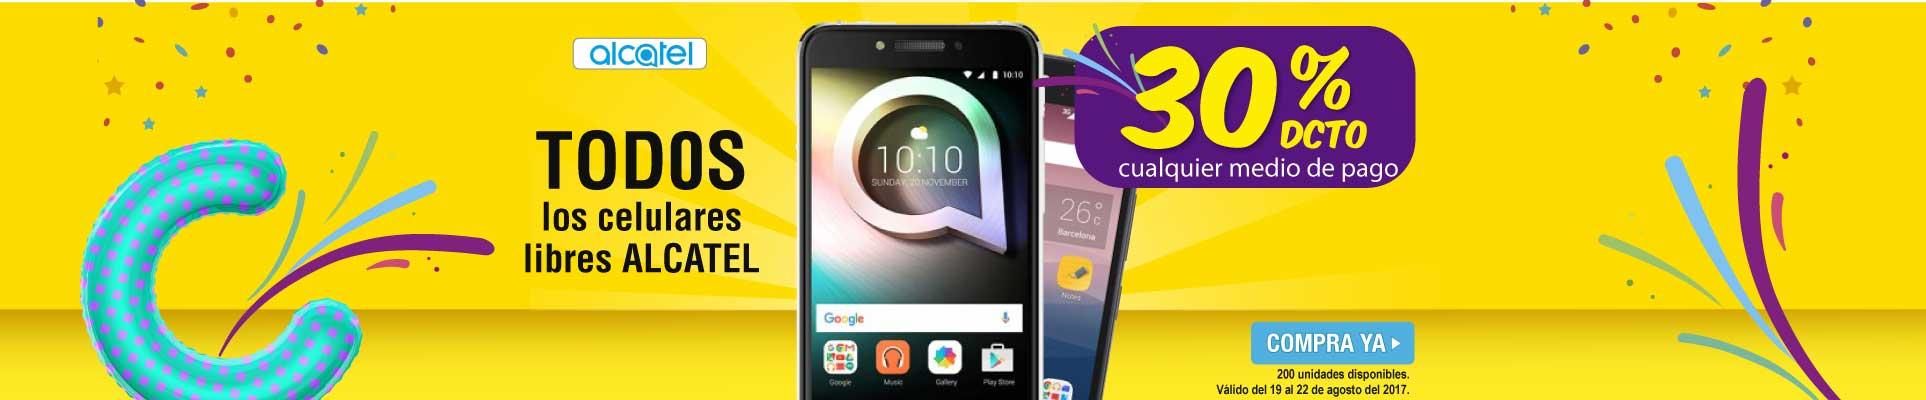 30 Dto. celulares Alcatel - banner principal